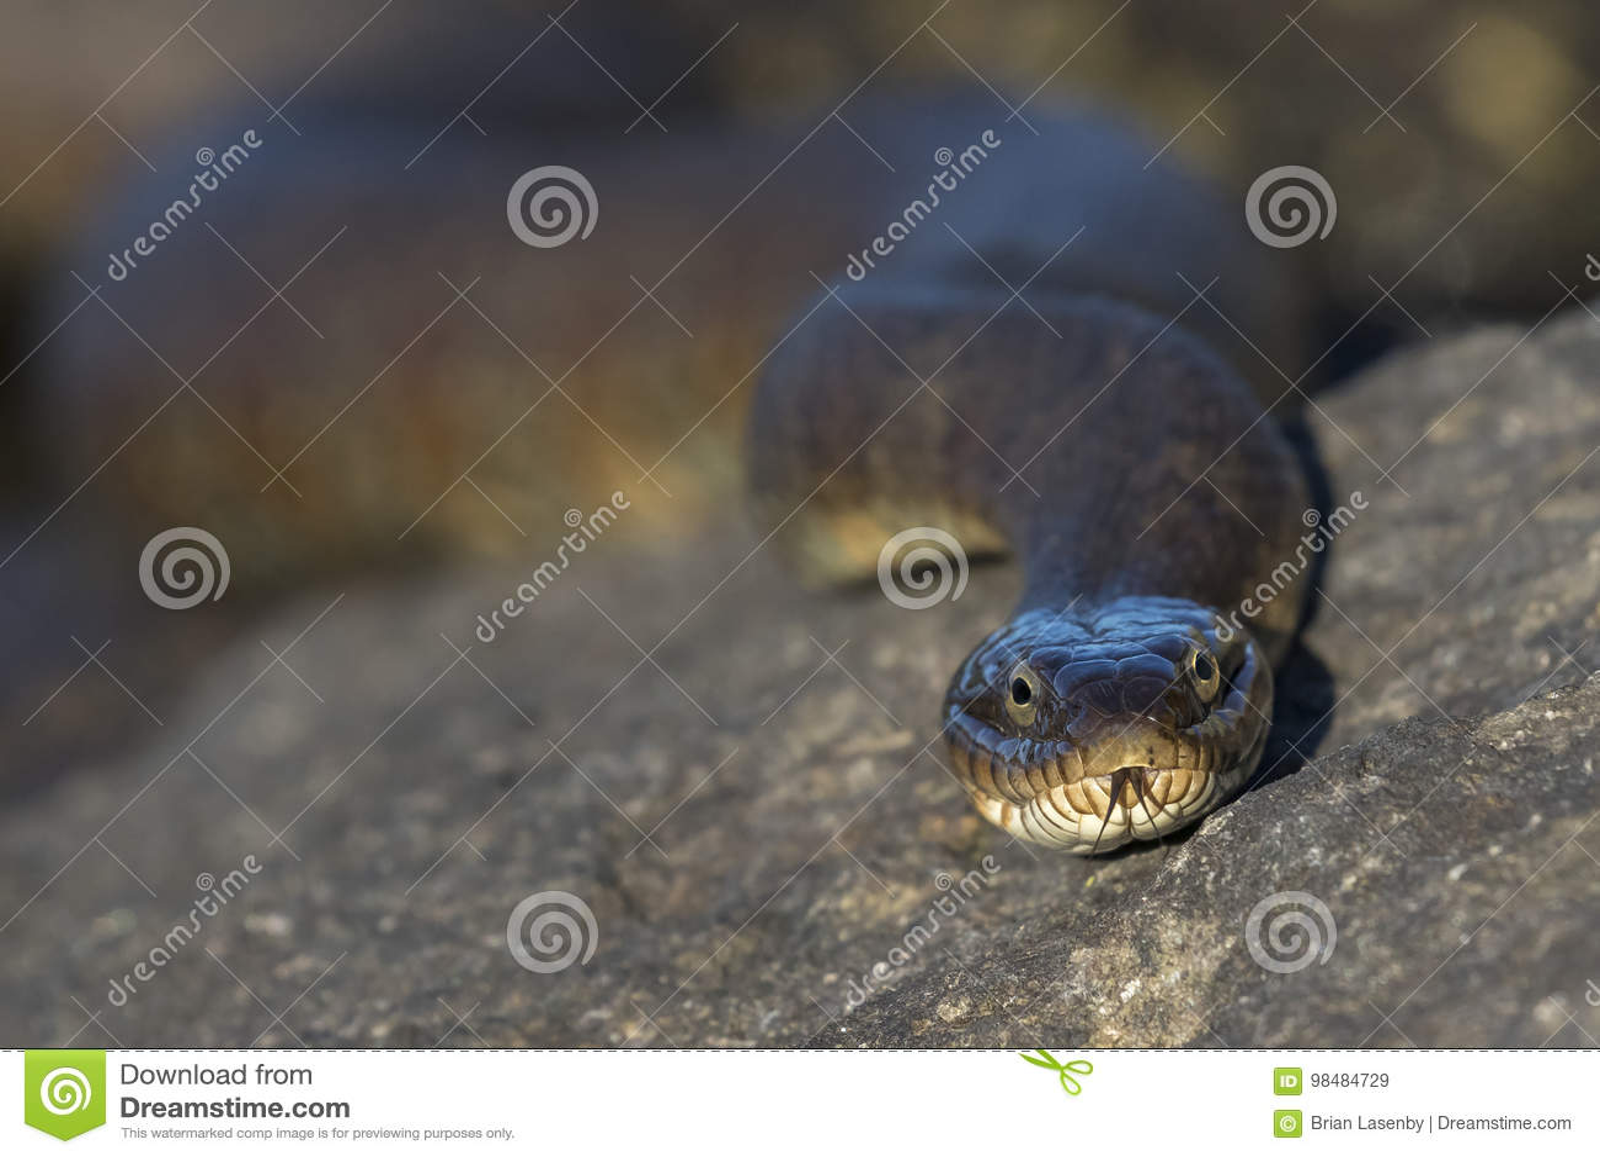 Closeup of a Northern Water Snake flicking its tongue - Ontario, Canada